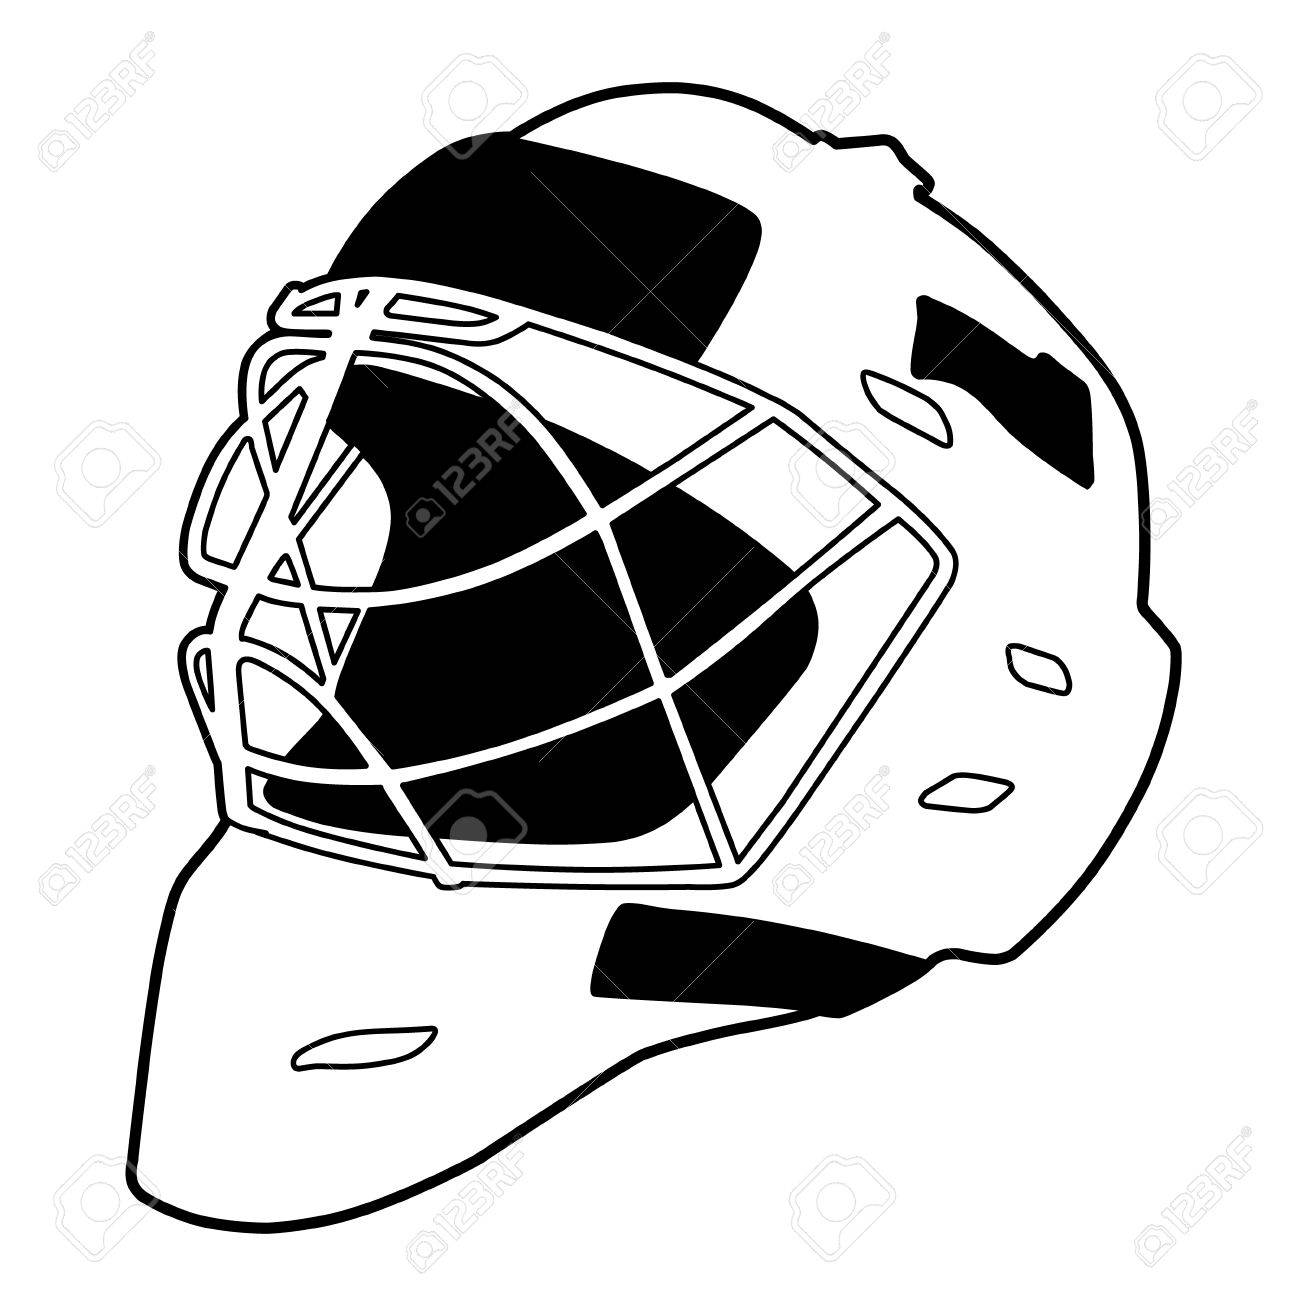 Hockey Helmet Isolated Vector Illustration Goalie Mask Royalty Free